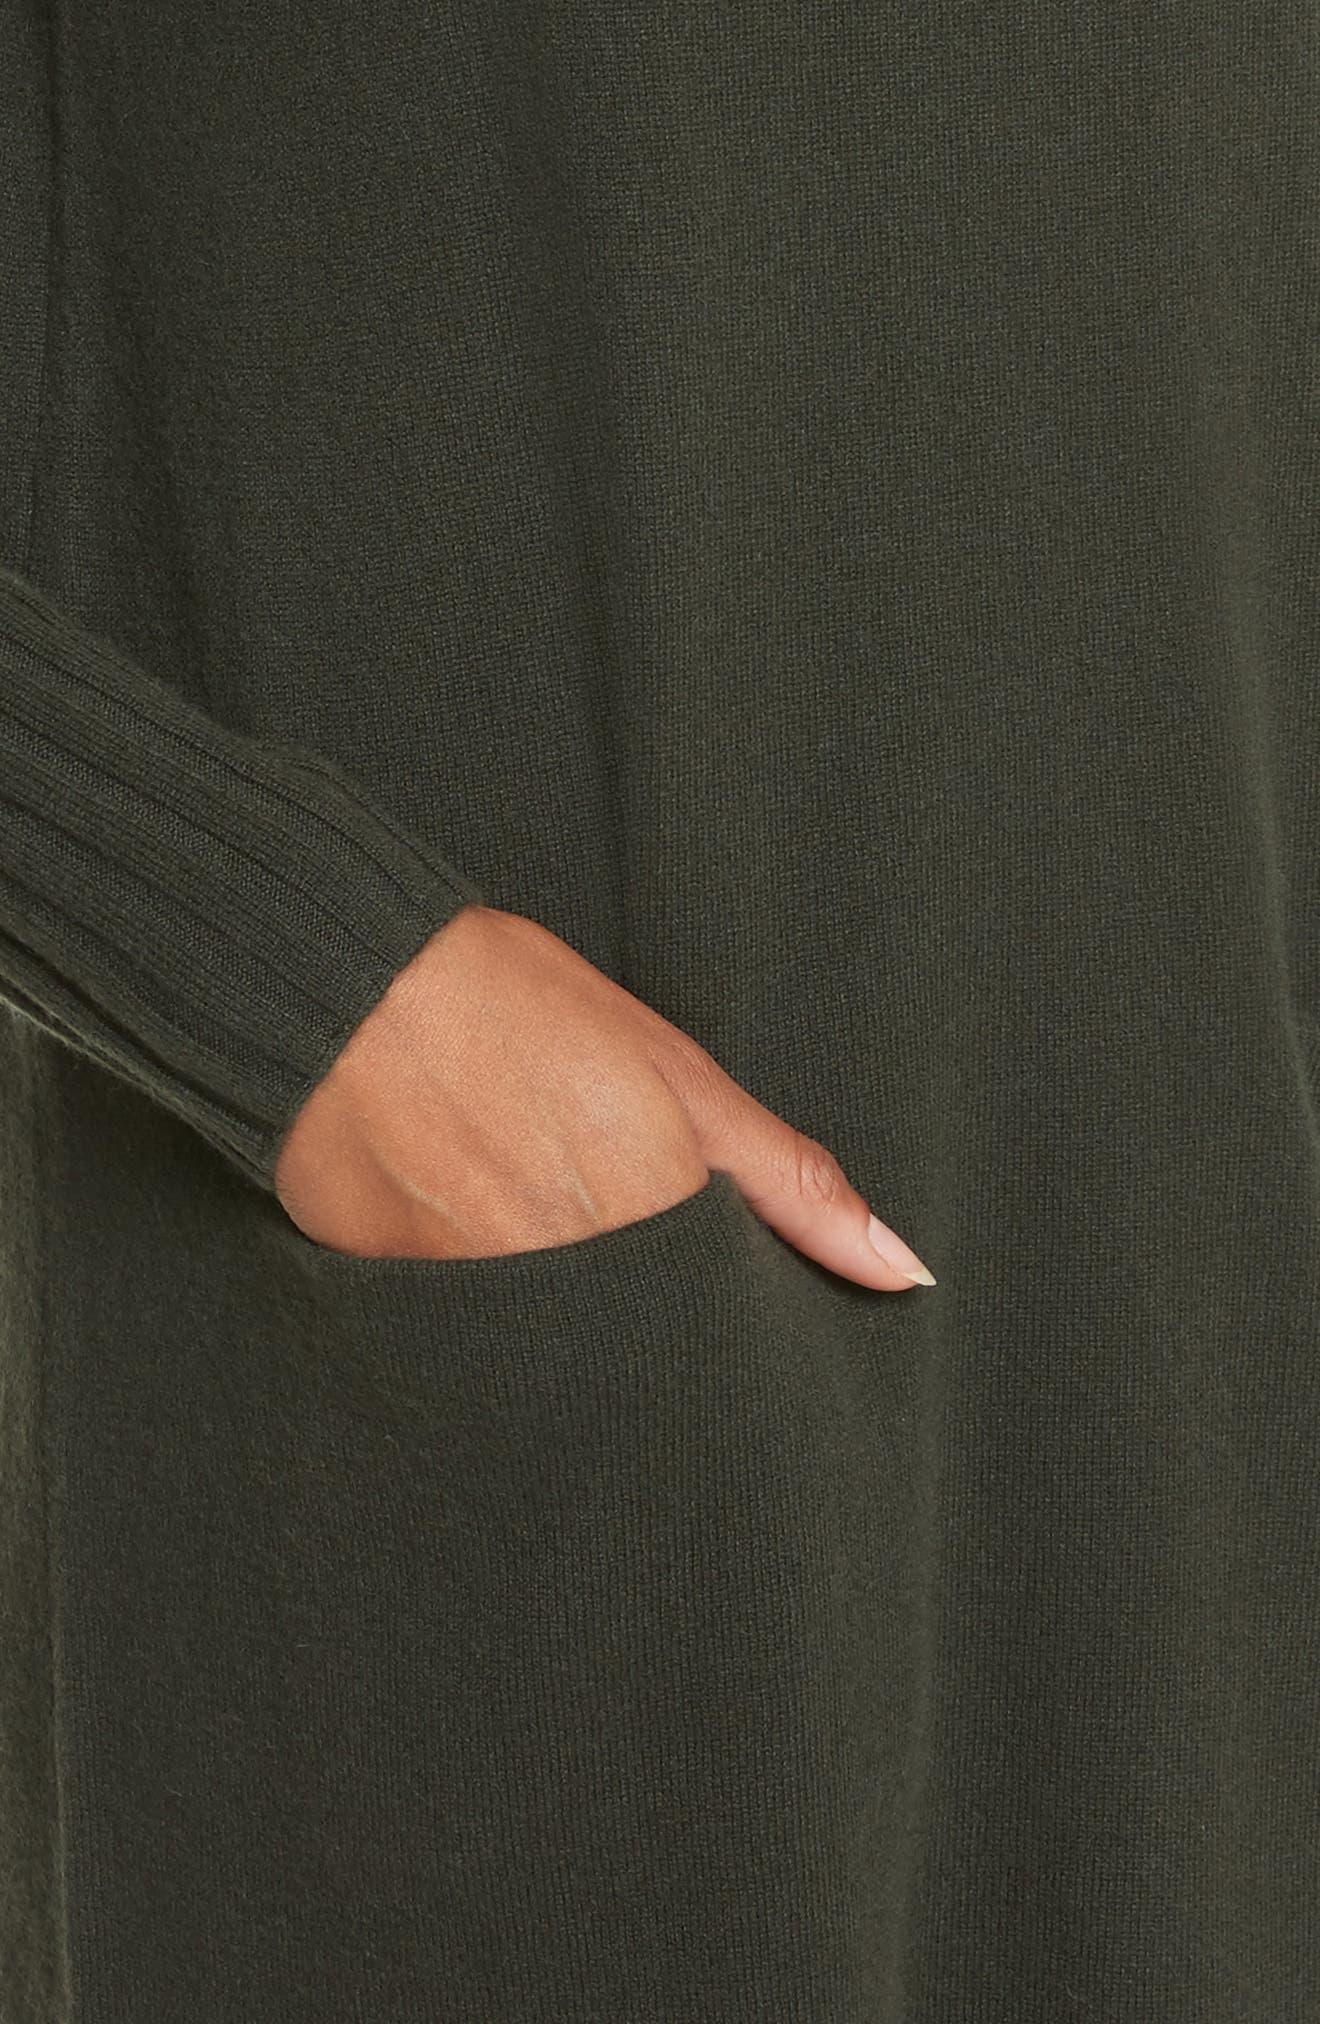 Cashmere Turtleneck Sweater Dress,                             Alternate thumbnail 4, color,                             300